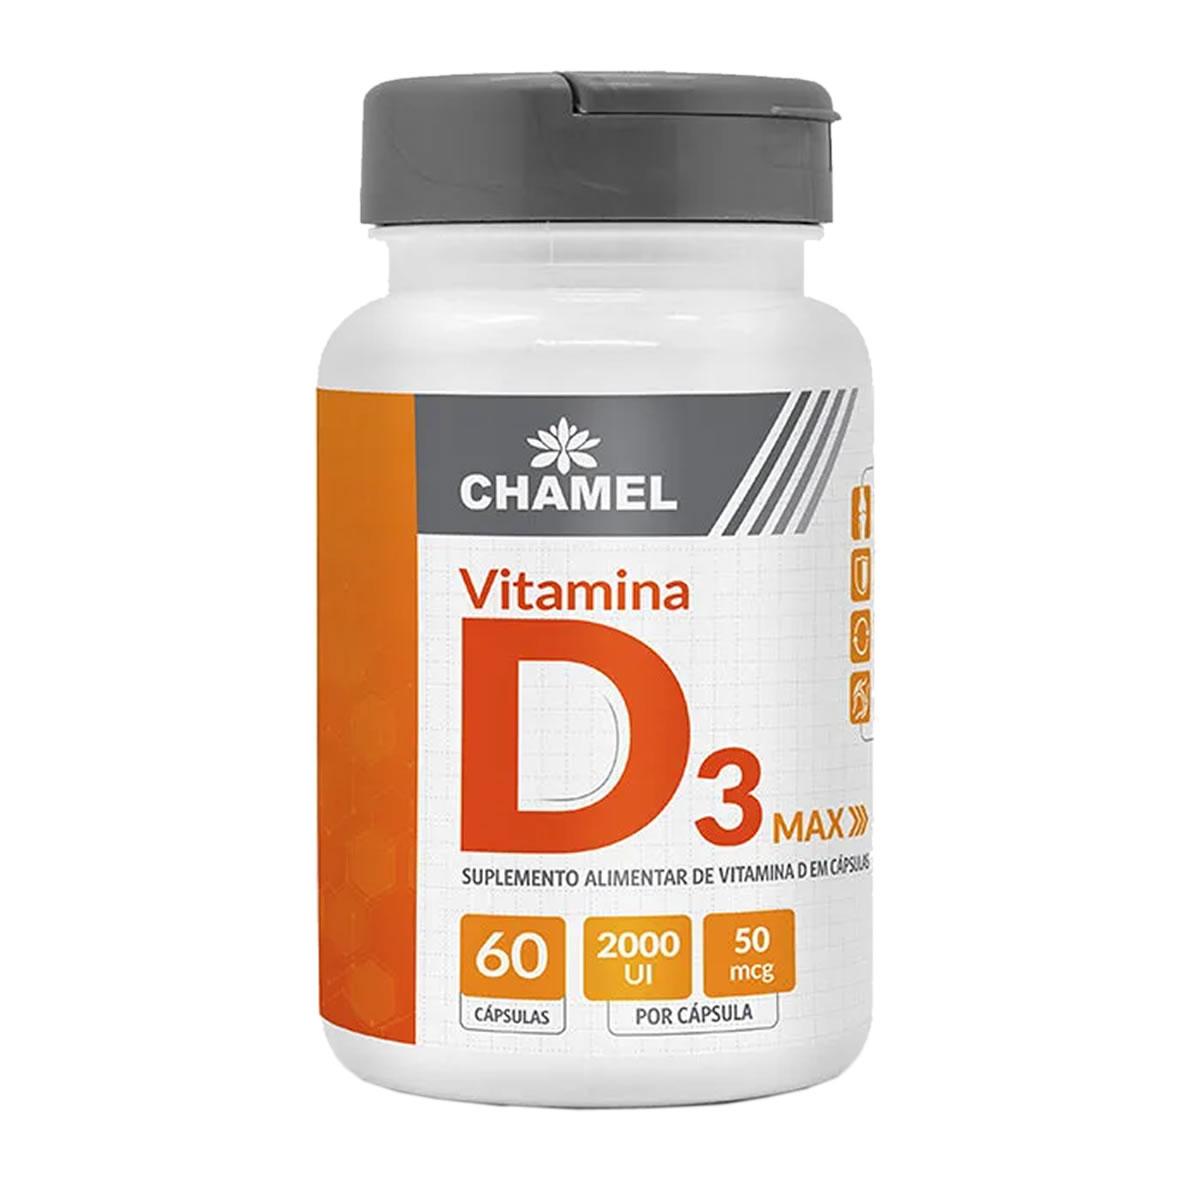 Vitamina D3 Max 500mg 60 Capsulas - Chamel